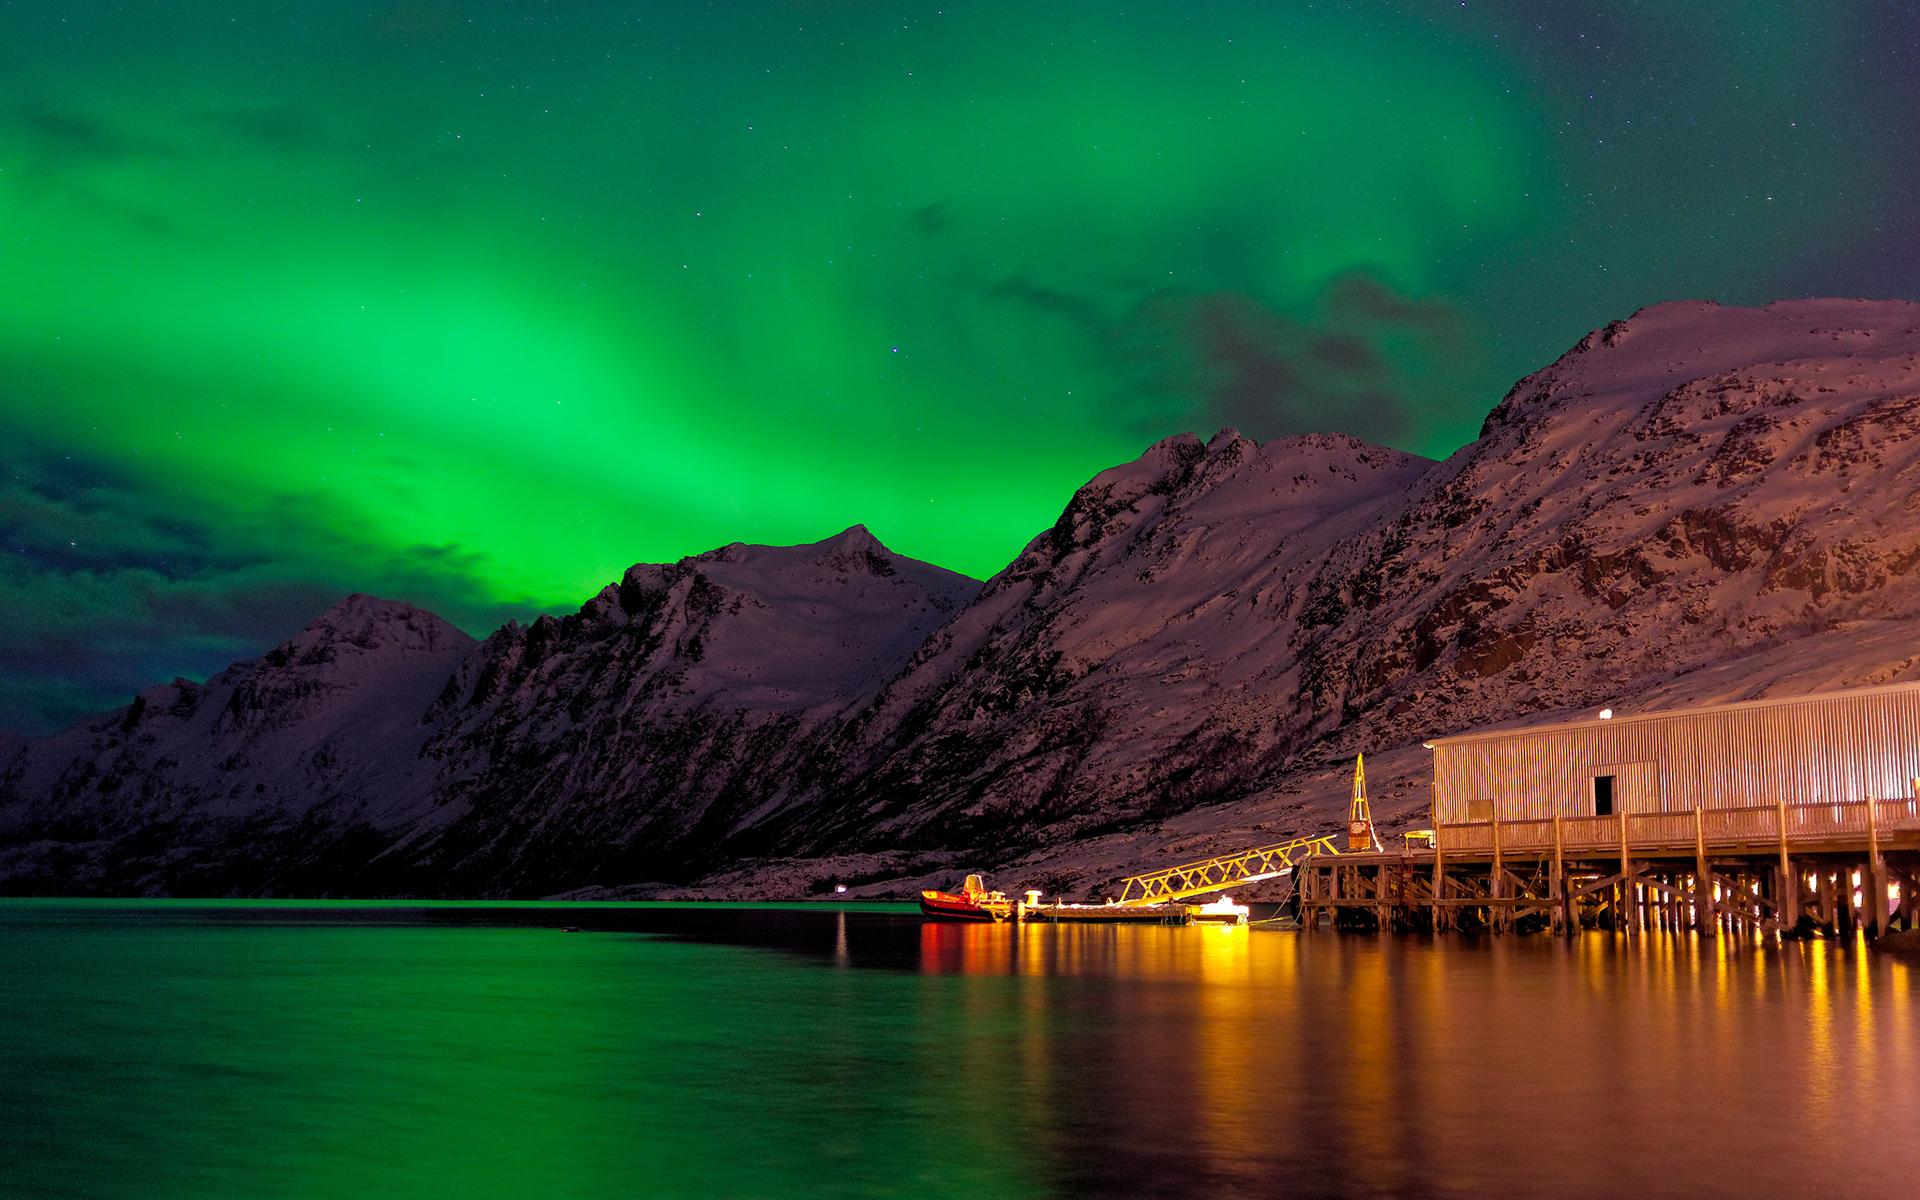 Plano De Fundo Full Hd: Aurora Boreal Papel De Parede HD